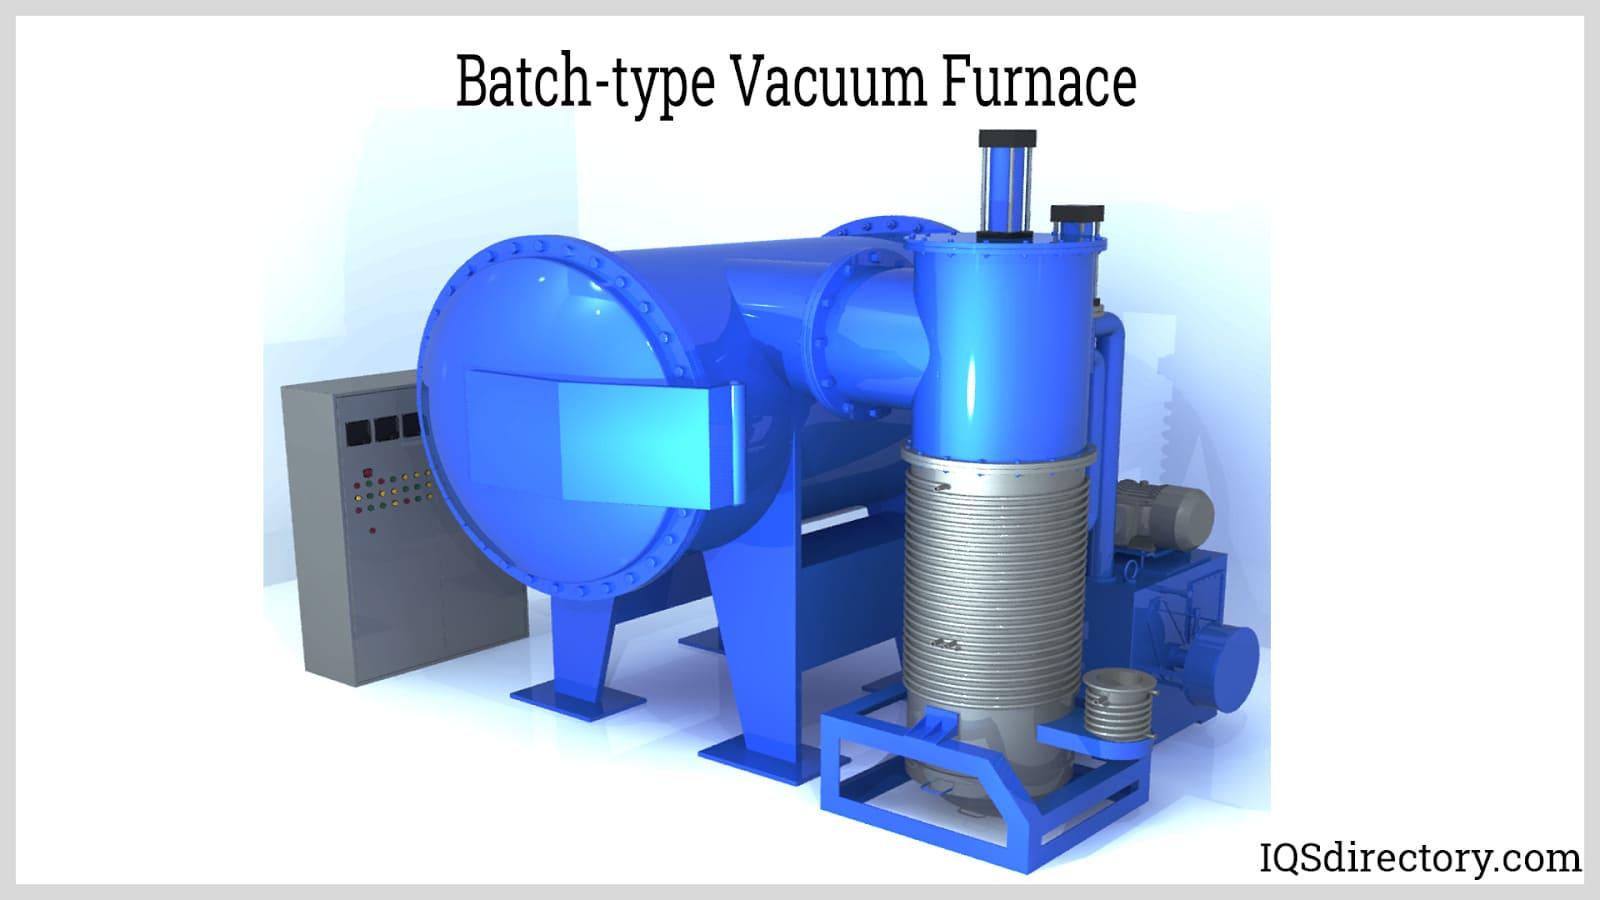 Batch-type Vacuum Furnace